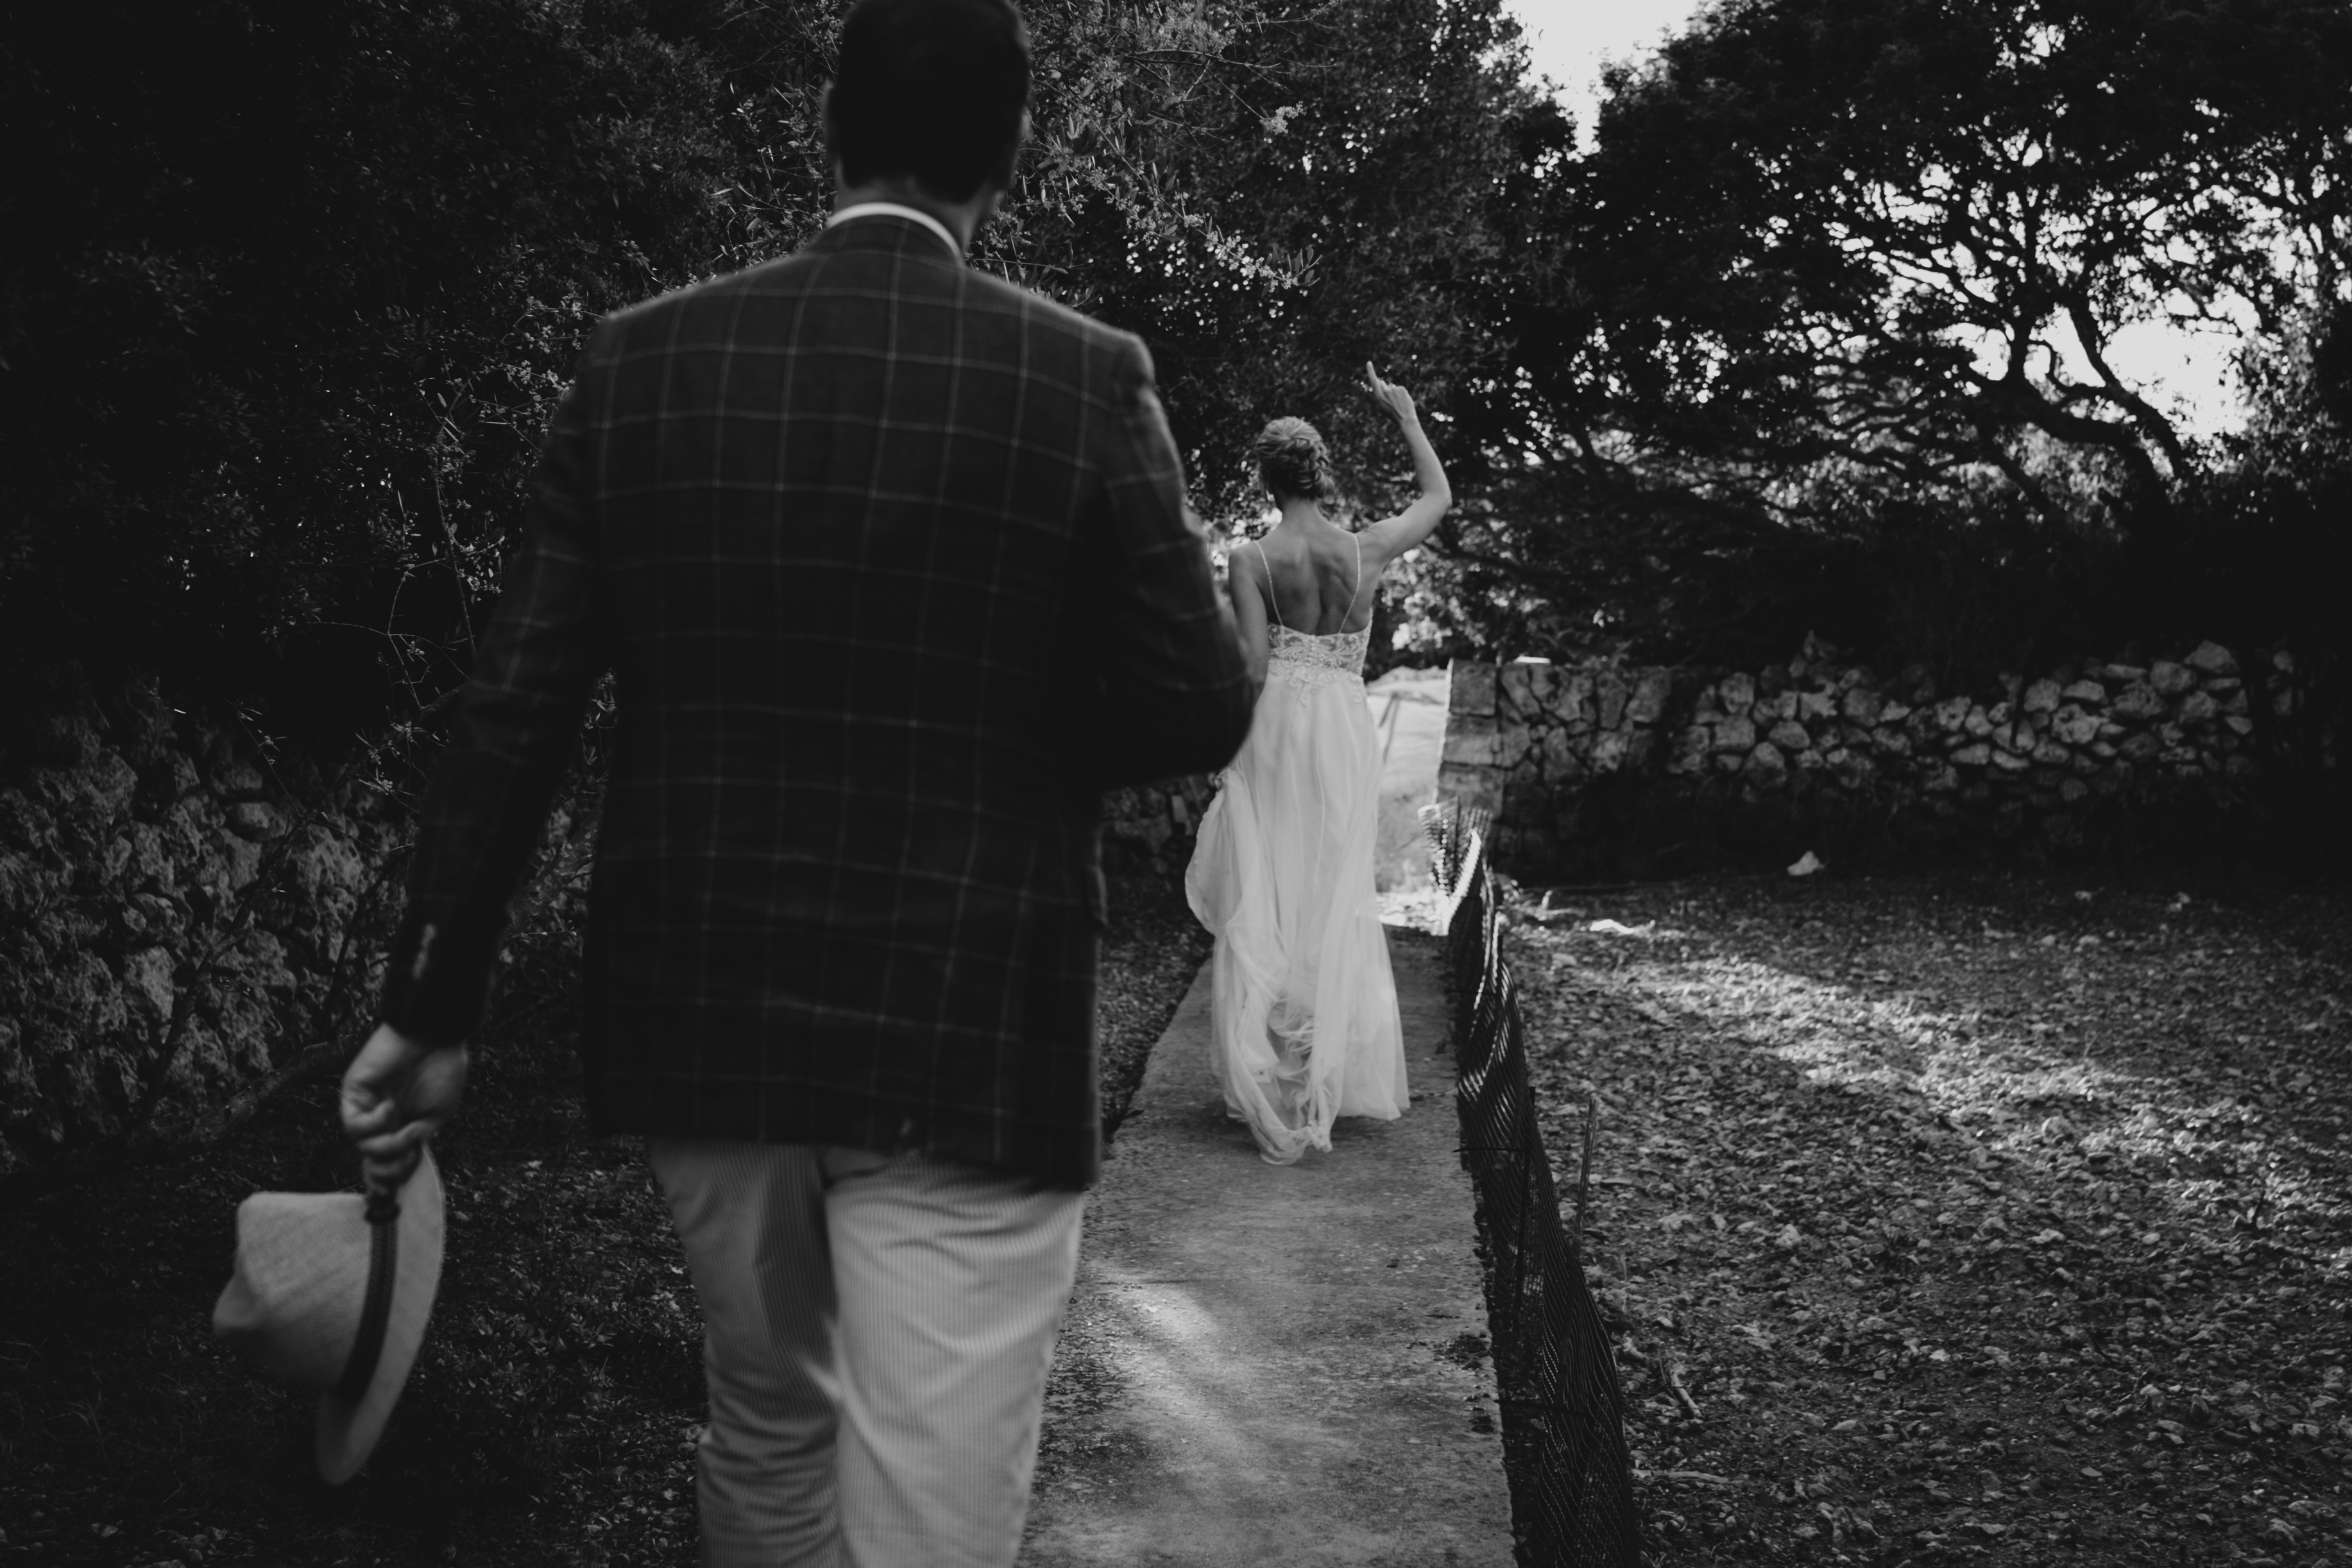 20190601 - Wedding Iris & Vicente52